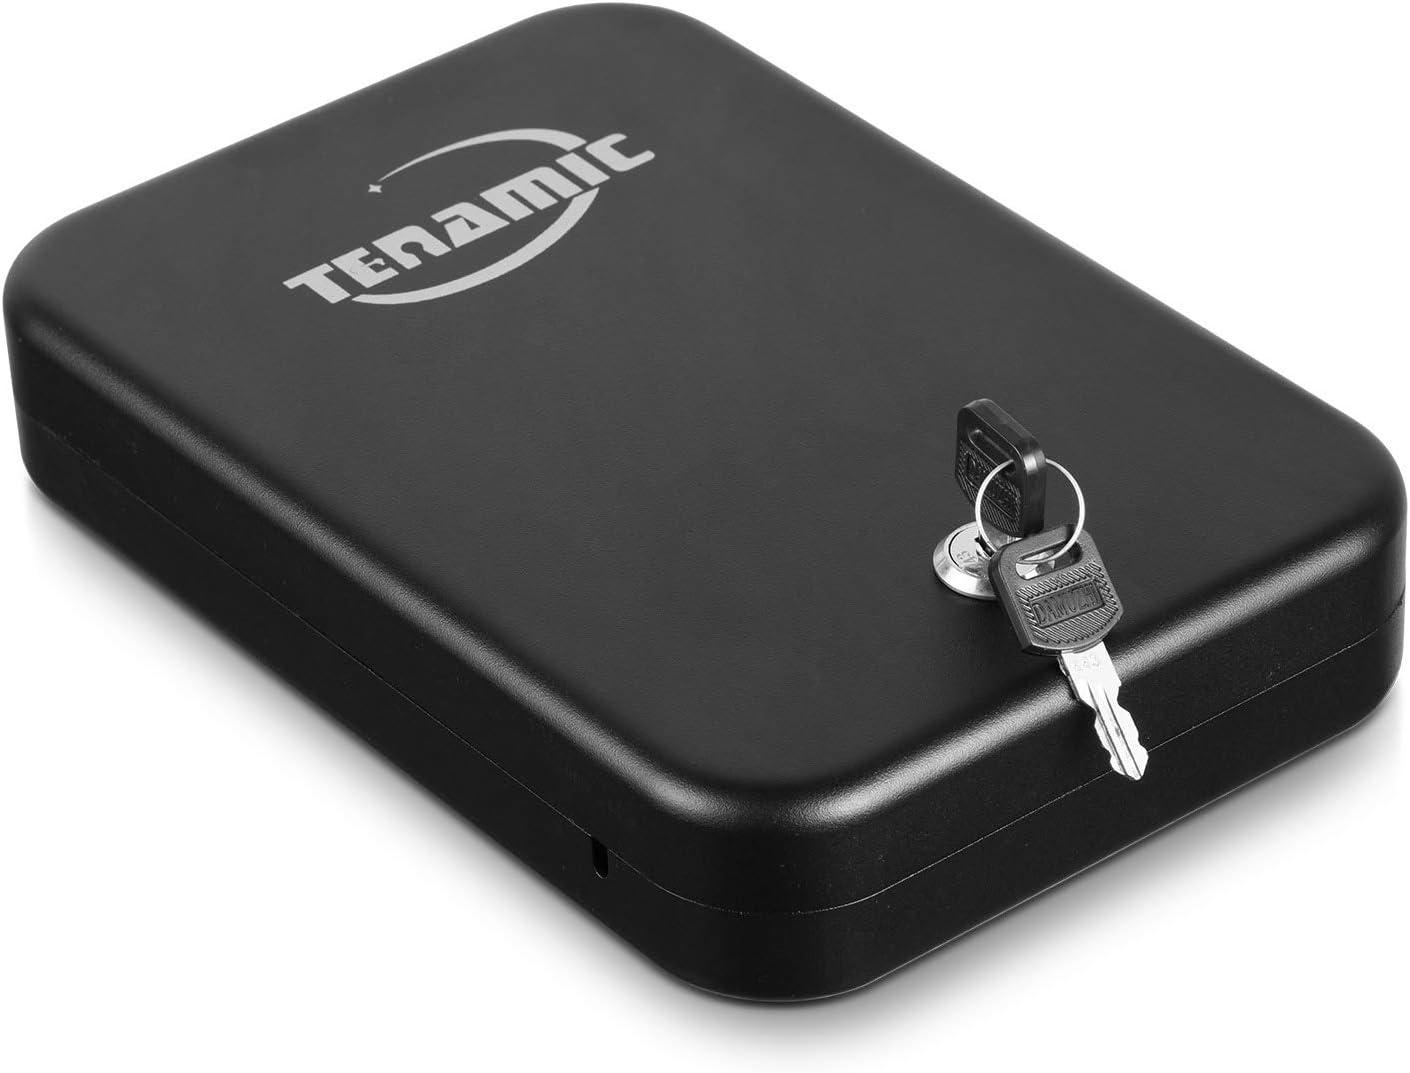 Tenamic Pistol Safe, Portable Travel Gun Safe, Solid Steel Handgun Lock Box for Home, Gun Safes for Car, Black